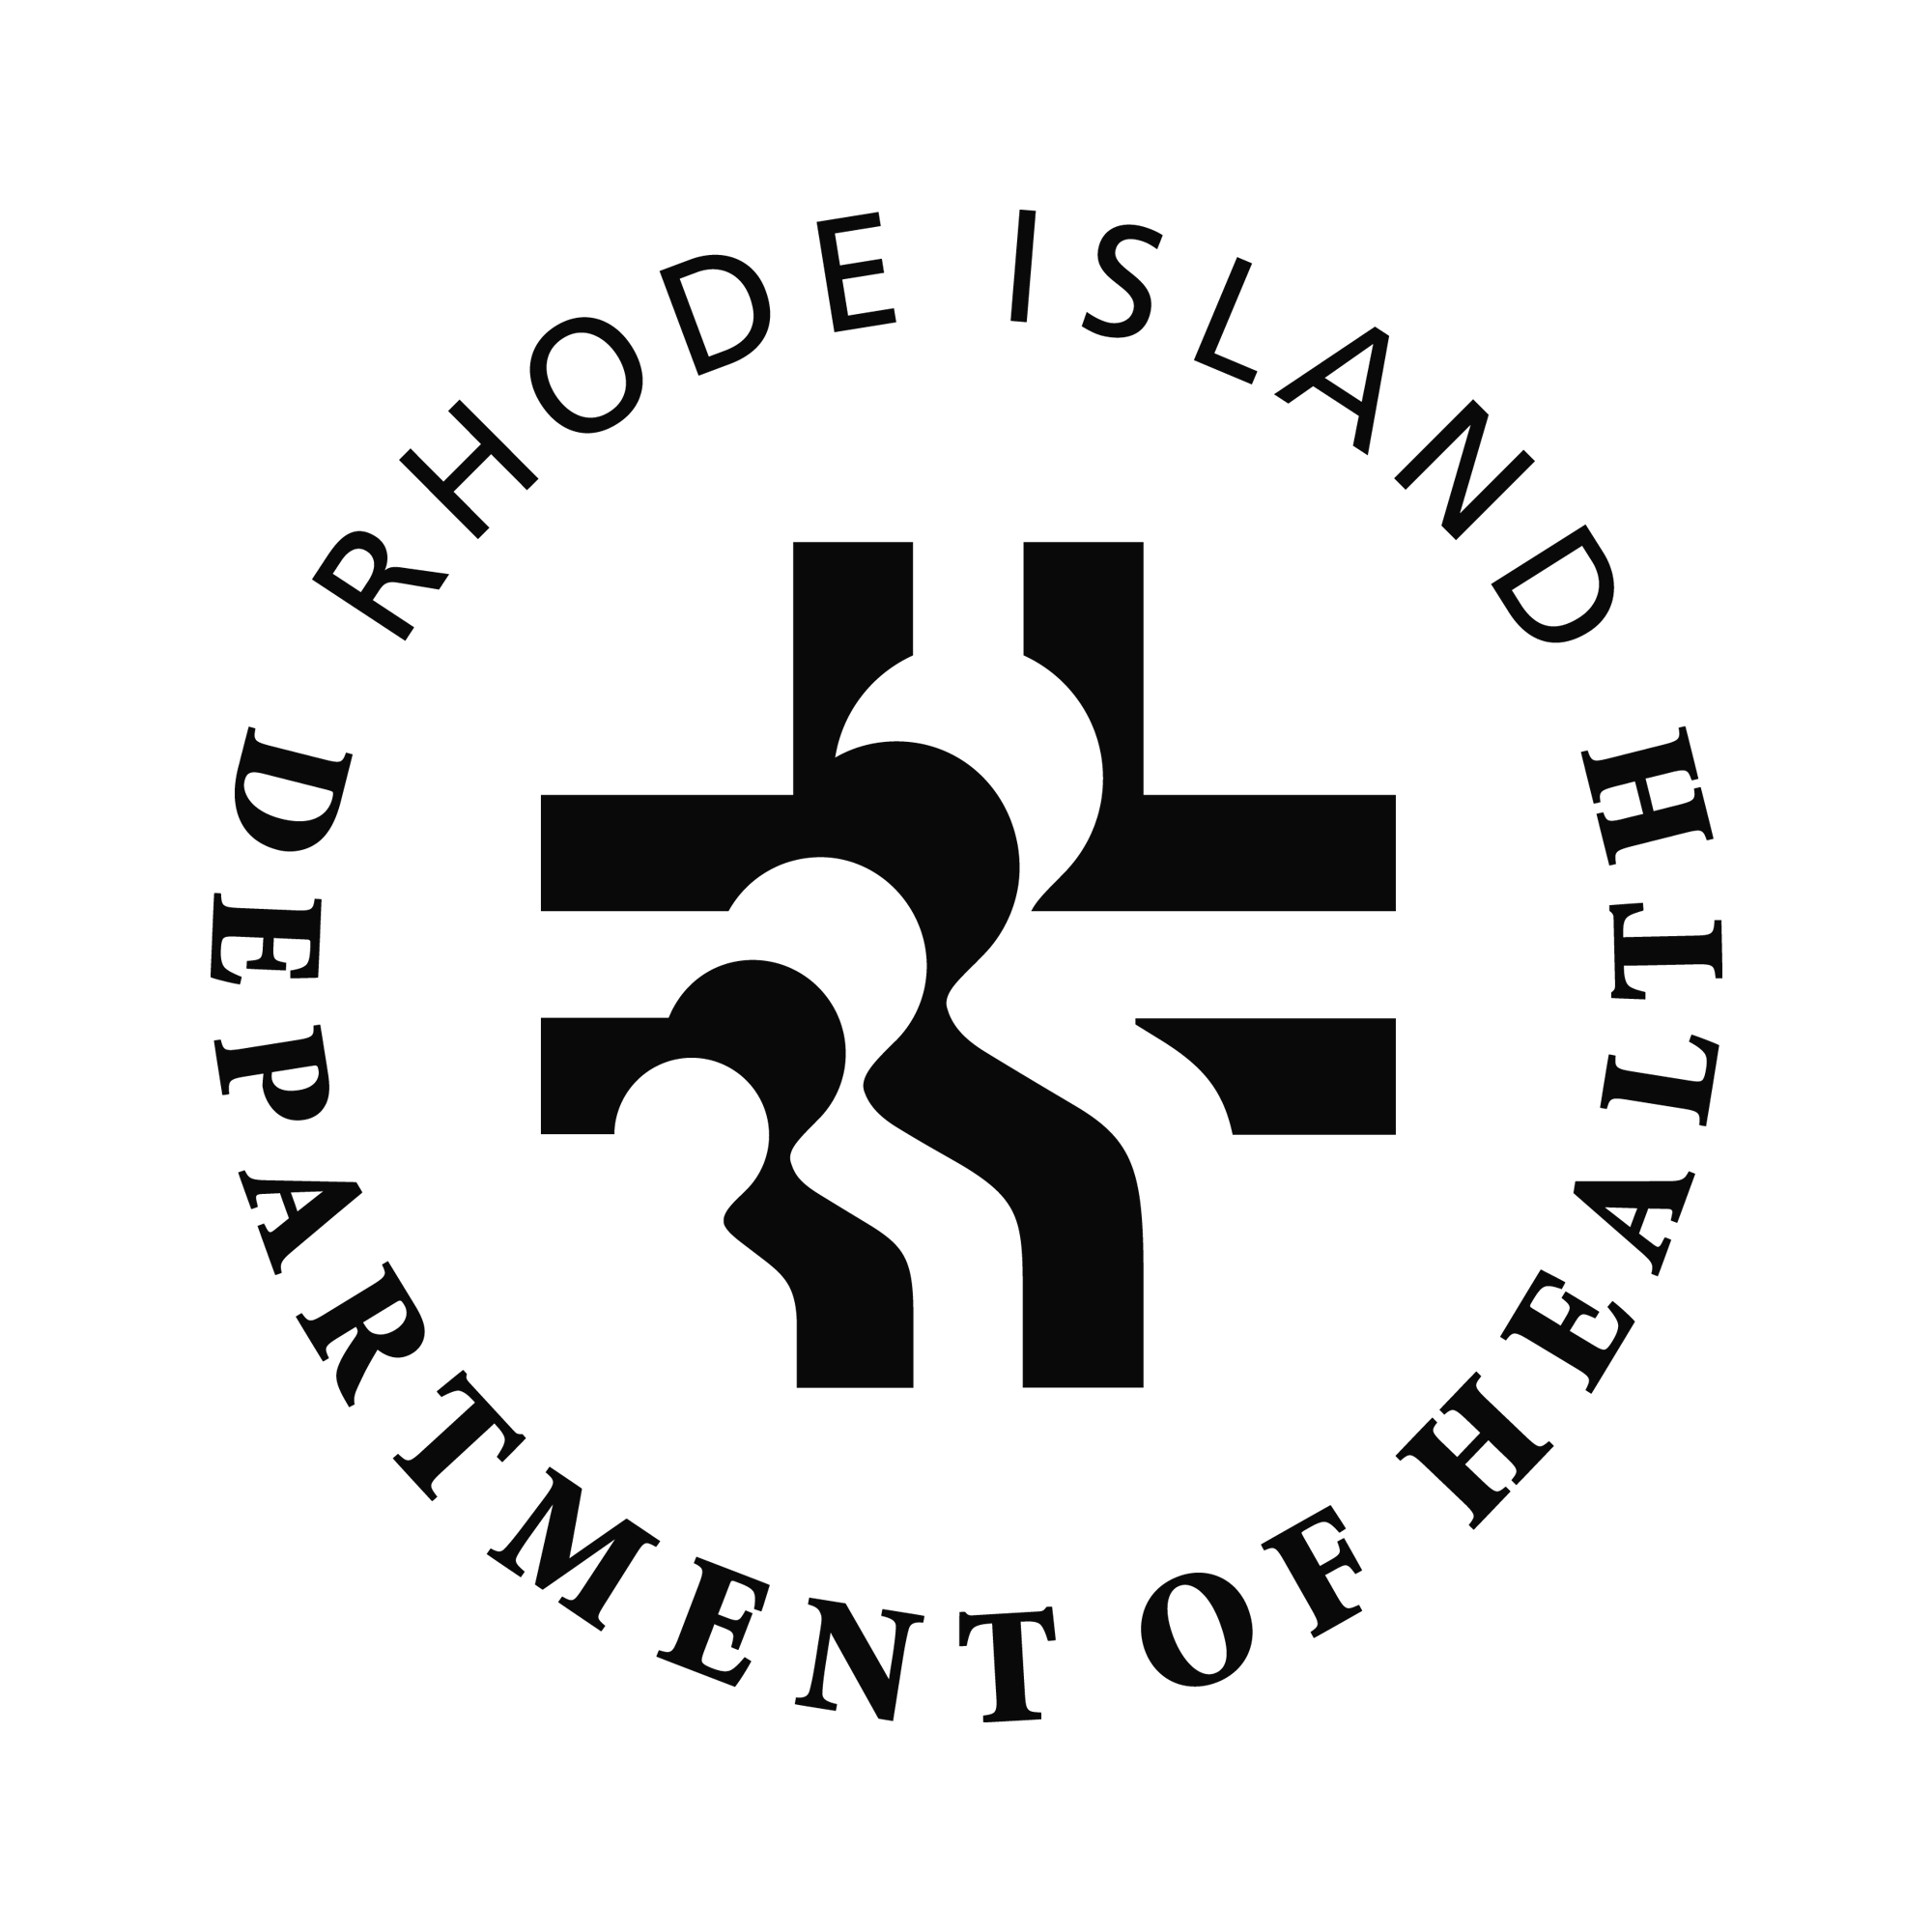 RI Department of Health